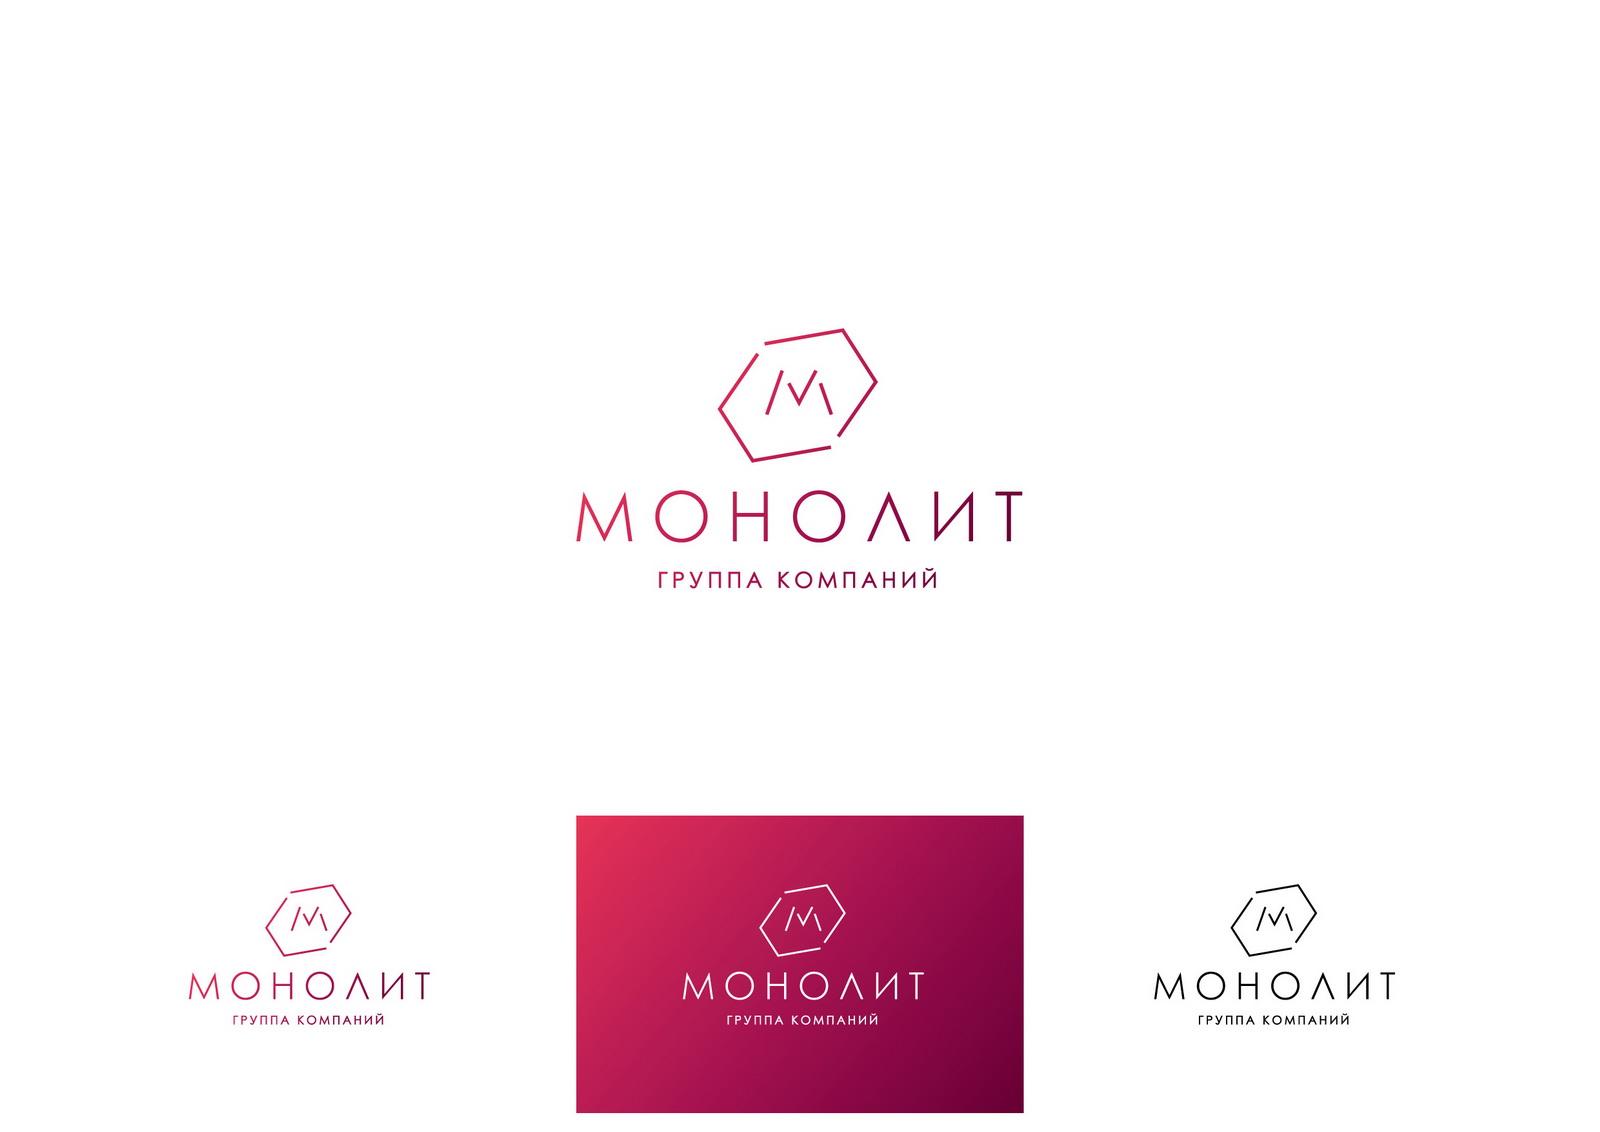 Разработка знака и логотипа МОНОЛИТ